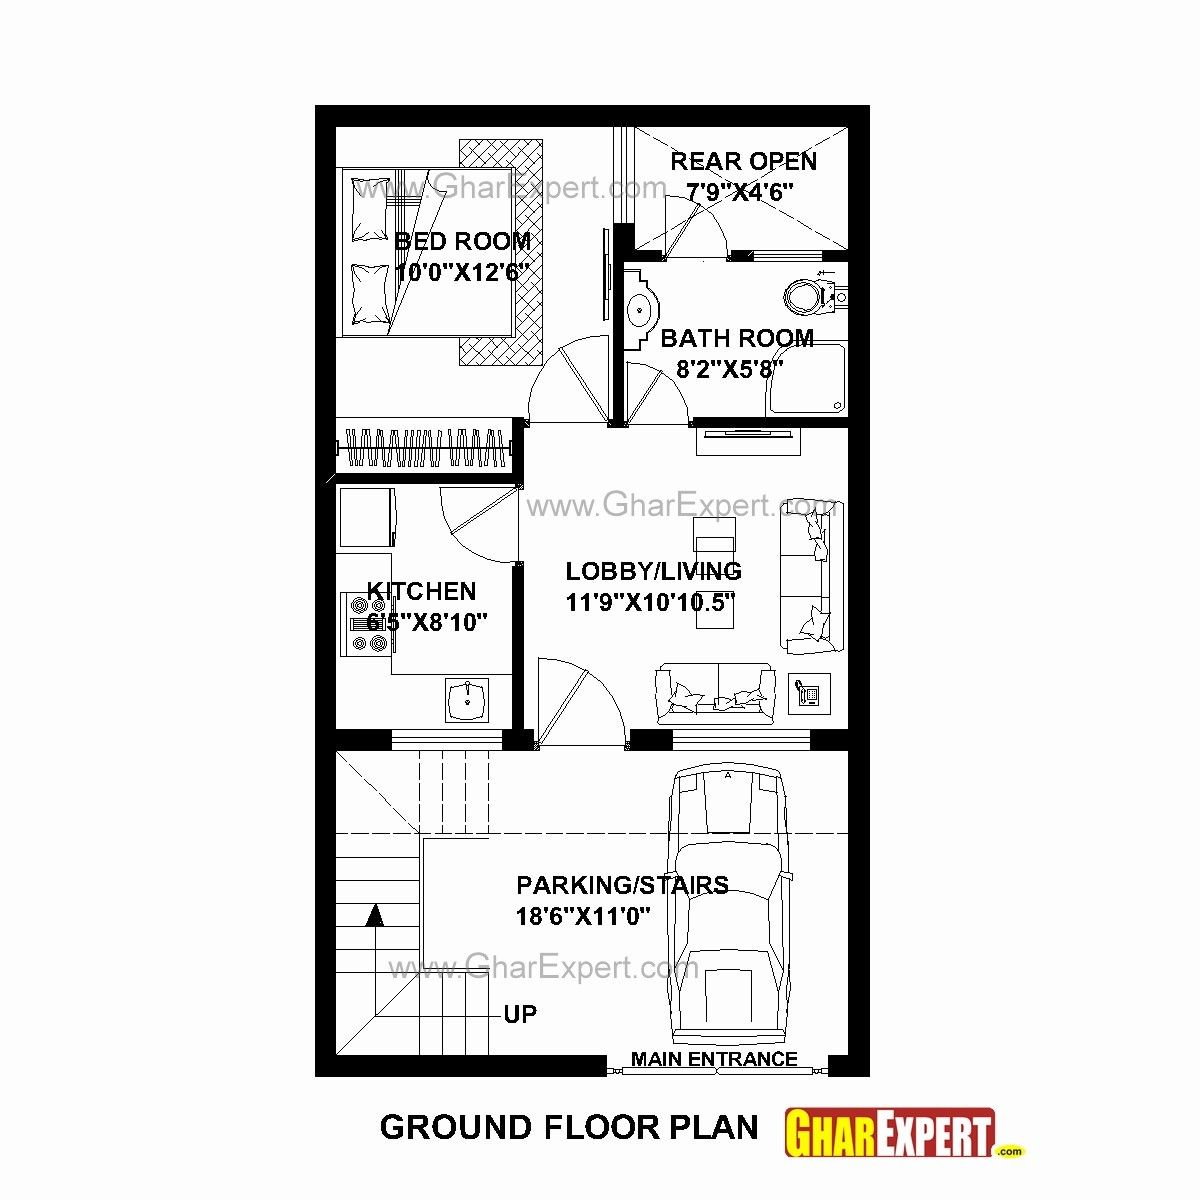 sq ft indian house plans best of square foot feet kerala home design also sherrie azredcher on pinterest rh